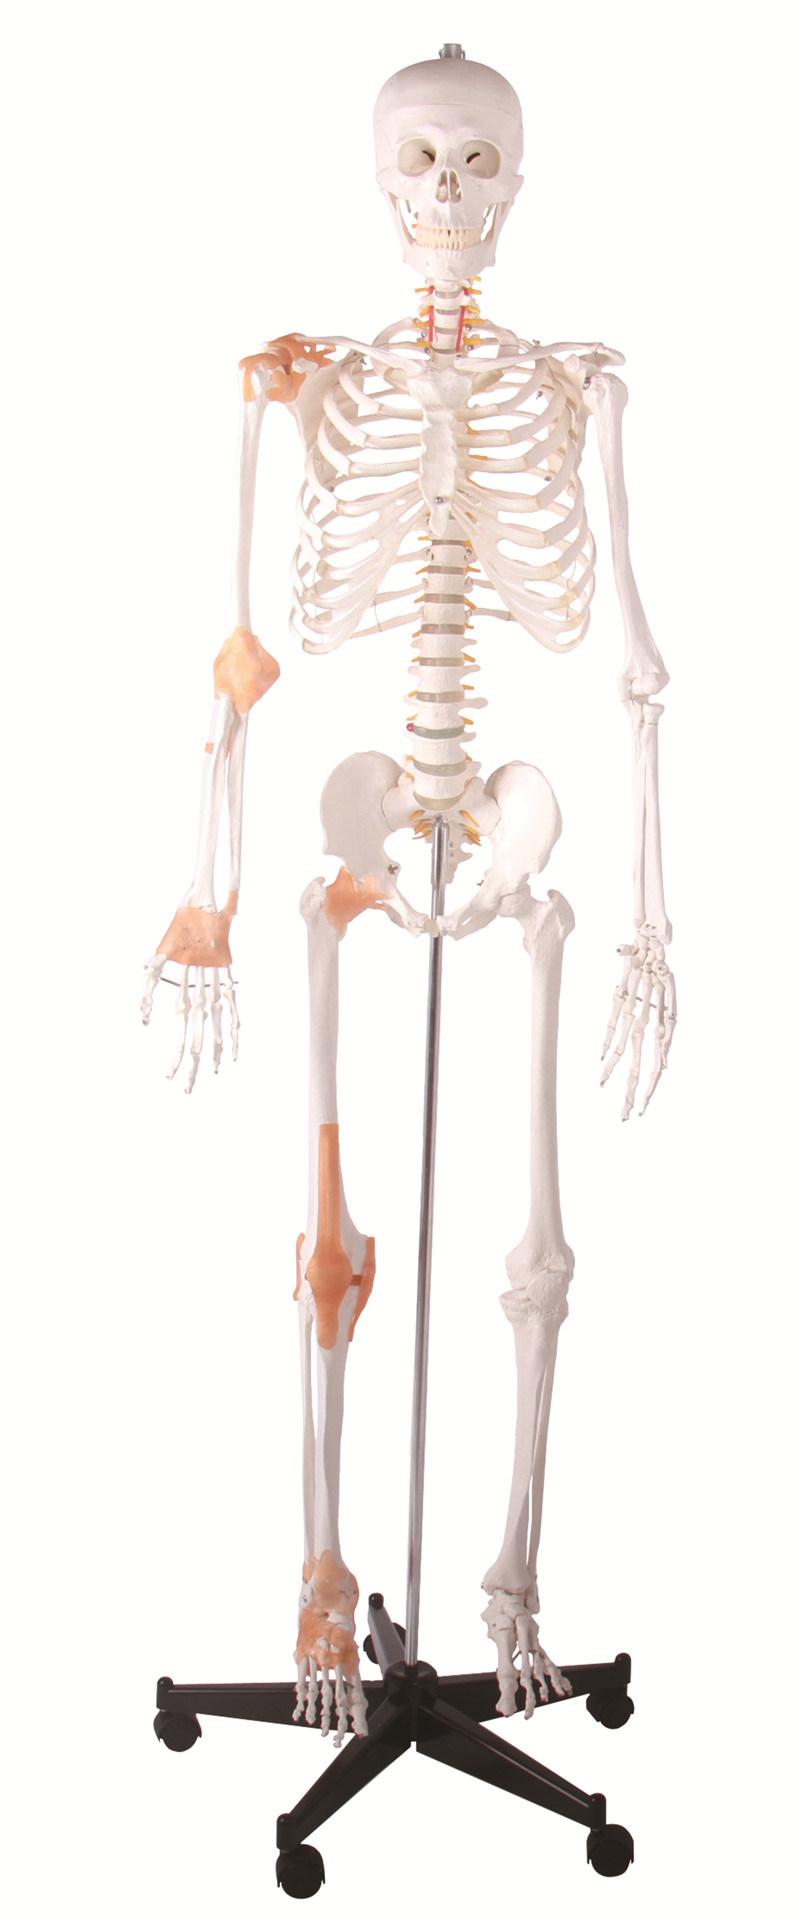 165cm Human Plastic Skeleton with Ligament